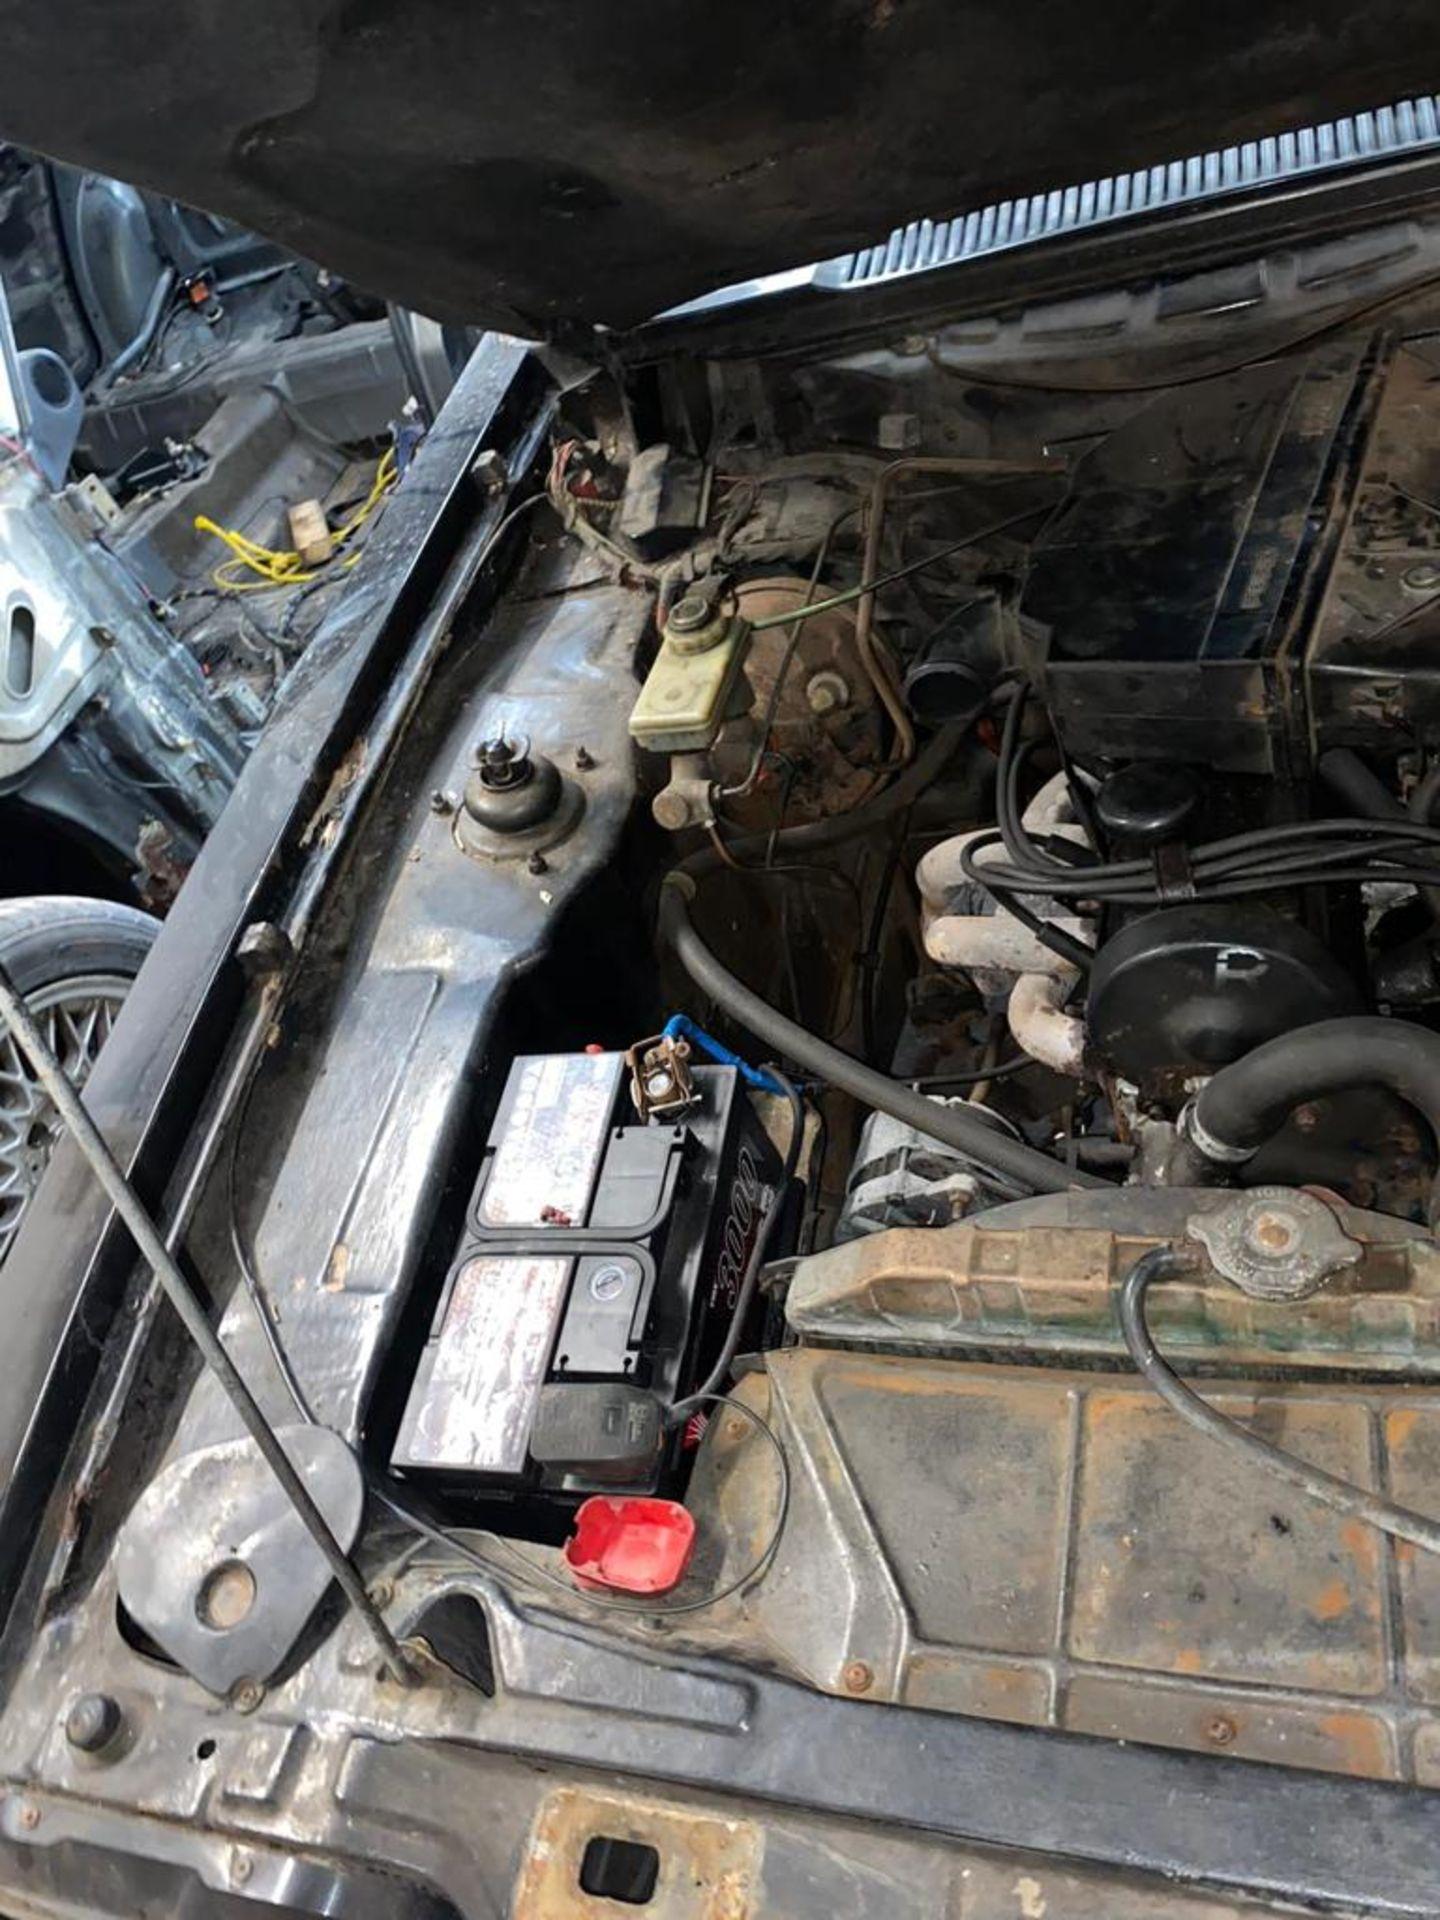 1986/C REG FORD CAPRI LASER AUTO 2.0 PETROL BLACK 3 DOOR *NO VAT* - Image 20 of 32